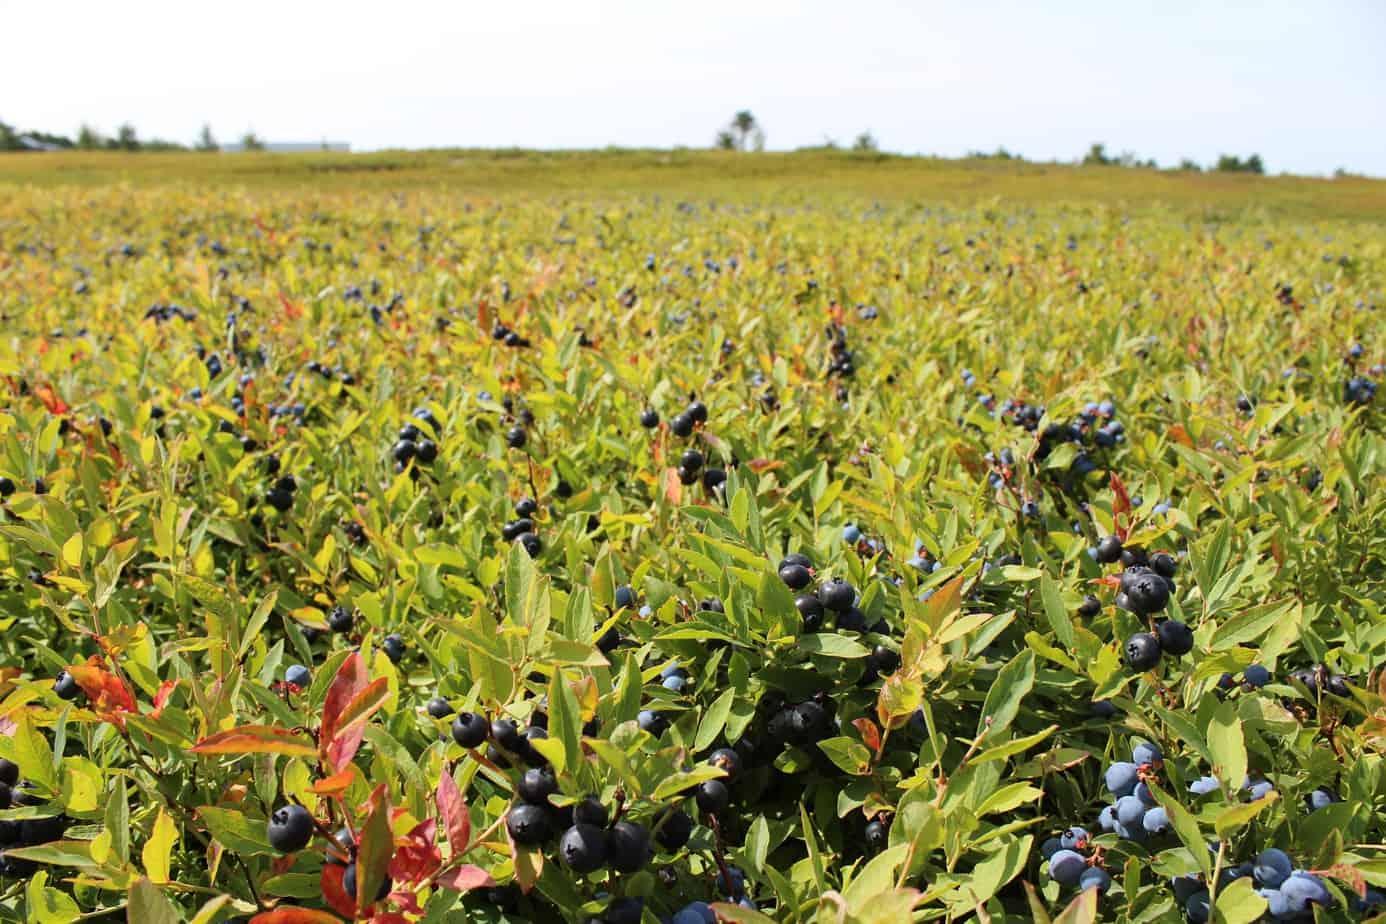 a field of wild blueberry plants